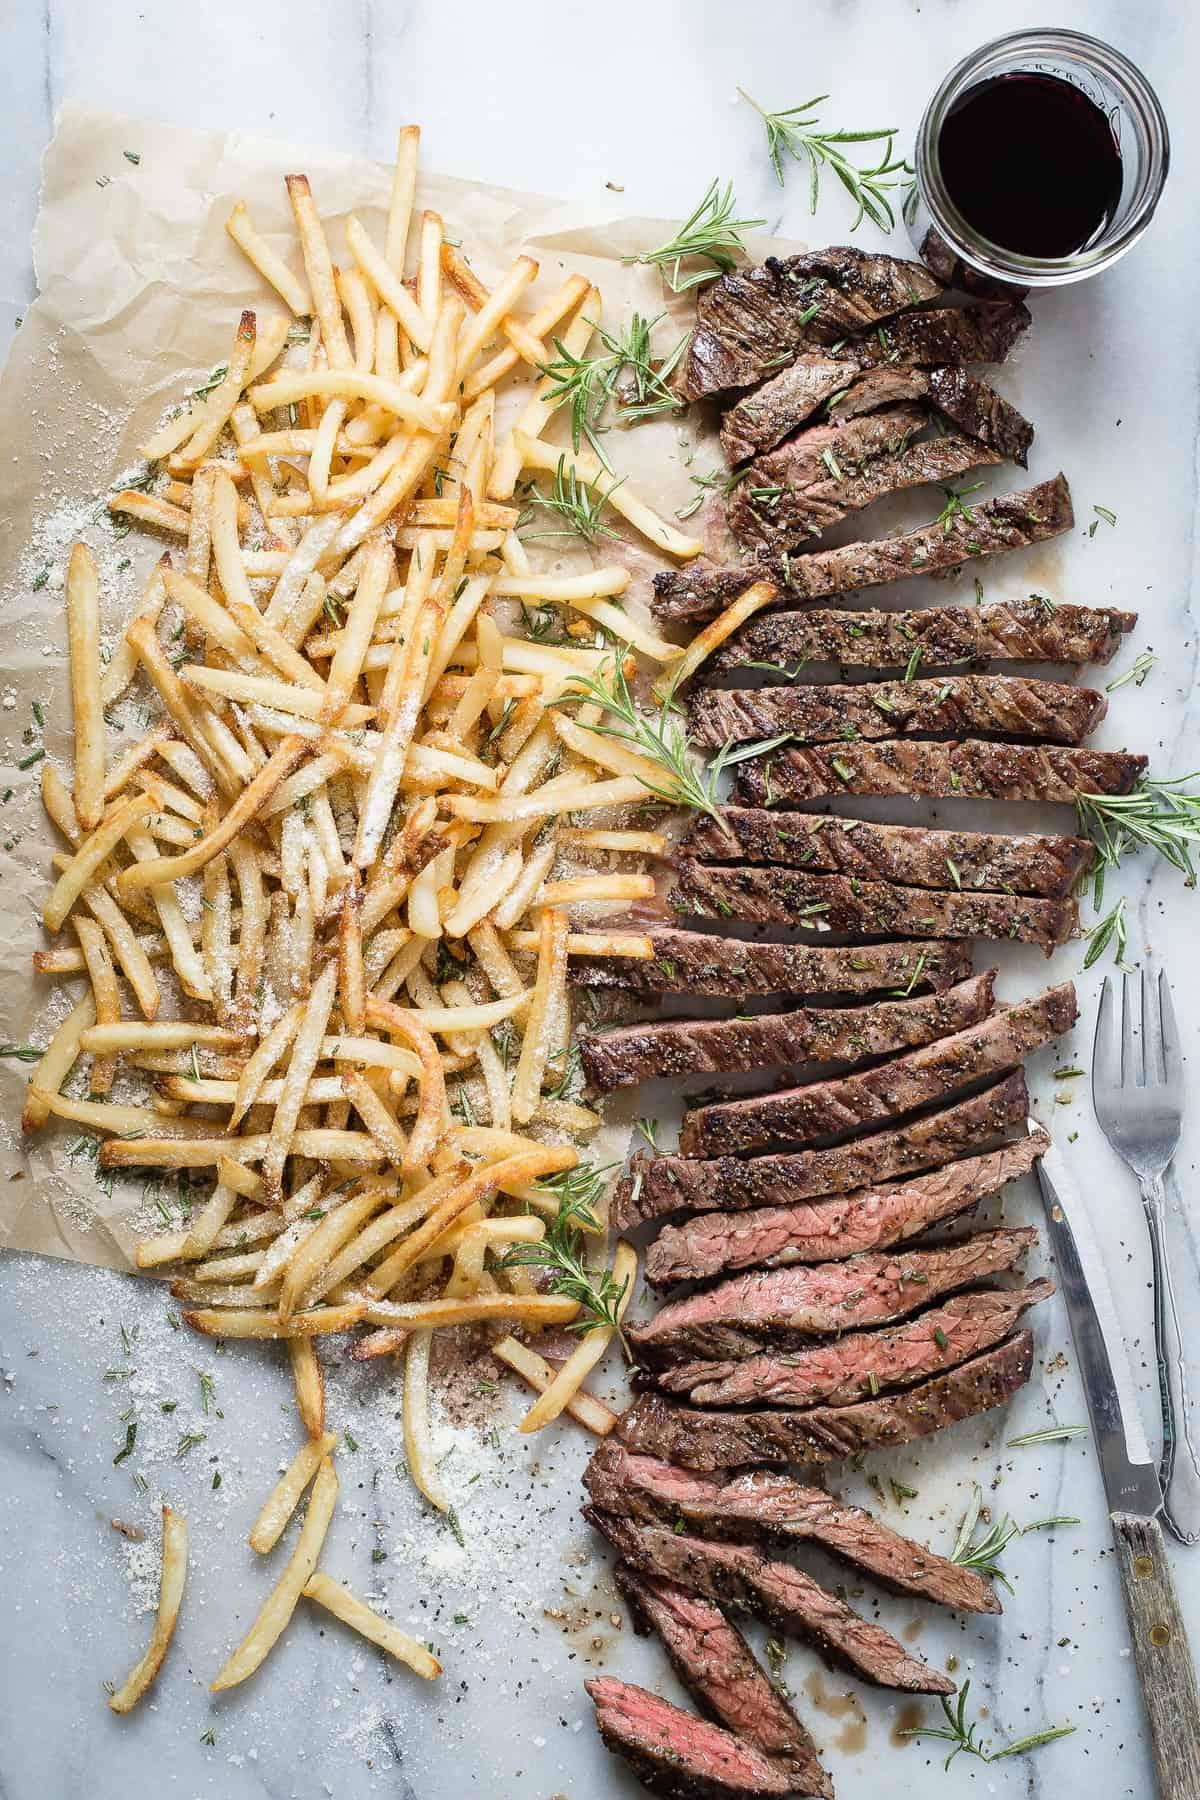 Skirt Steak with Truffle Oil Parmesan Fries